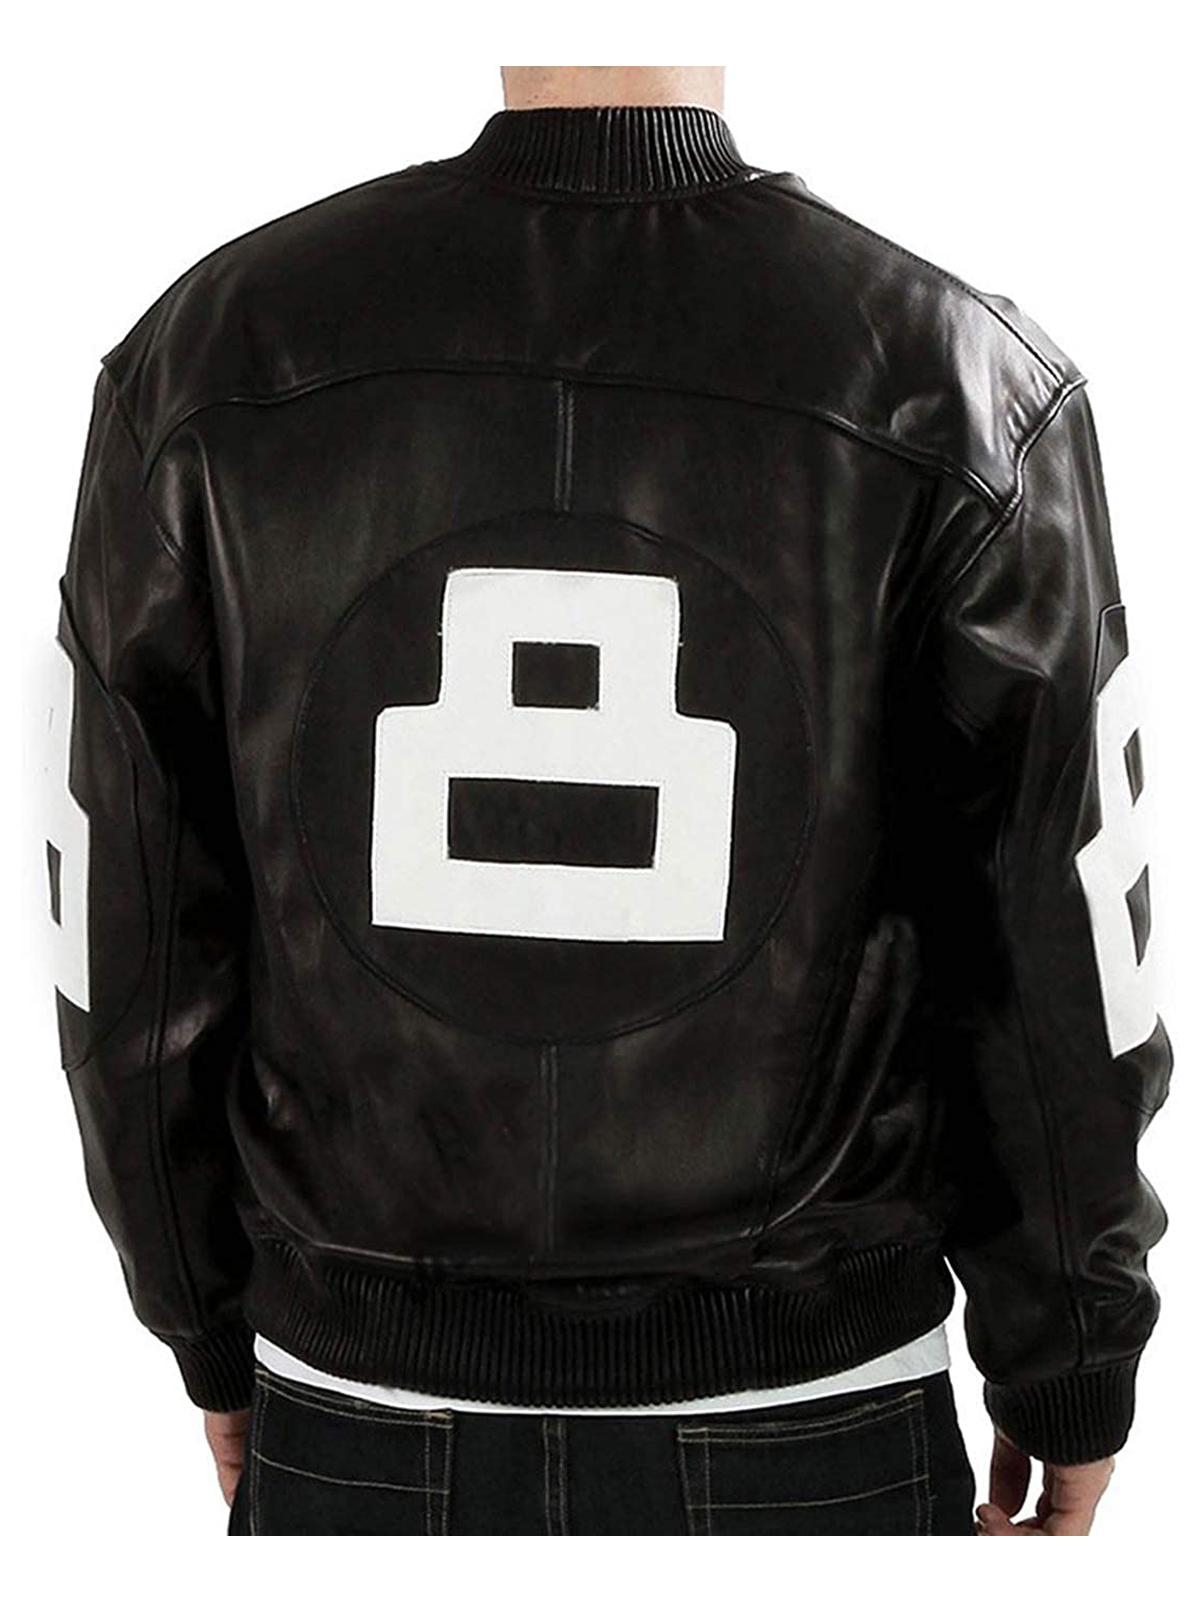 Mens Black Leather 8 Ball Bomber Jacket